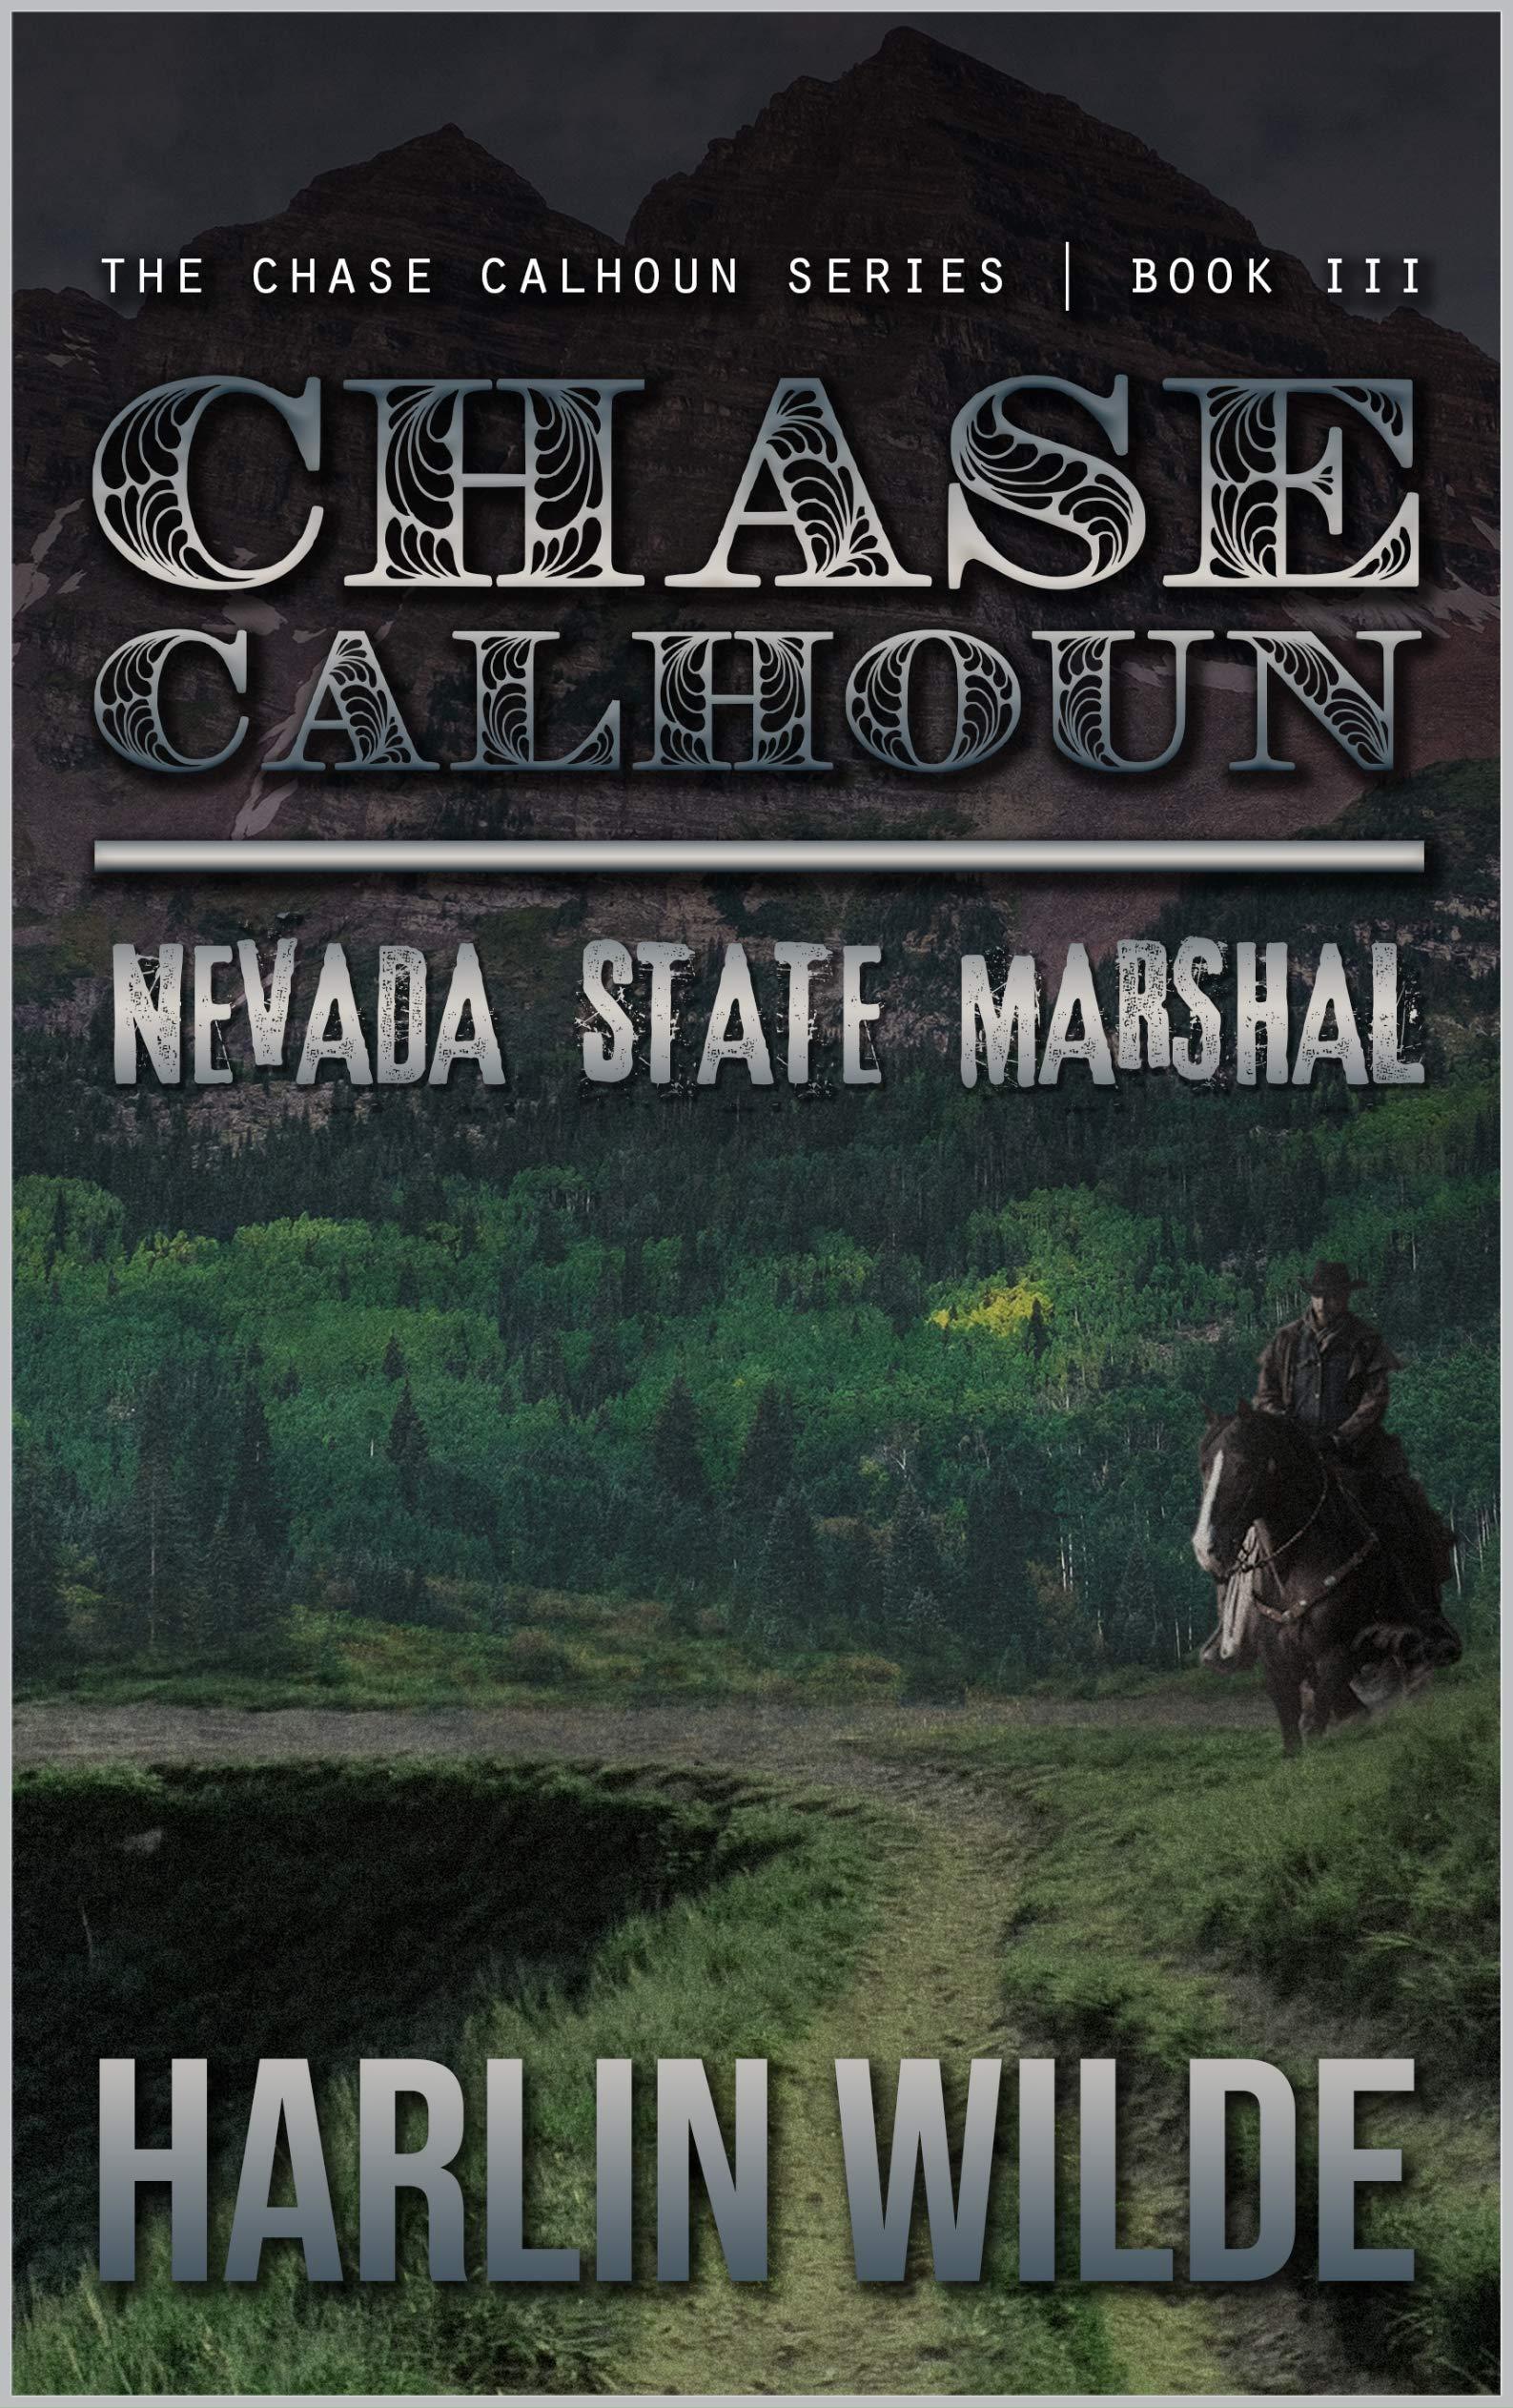 CHASE CALHOUN: Nevada State Marshal (Chase Calhoun Series Book 3)